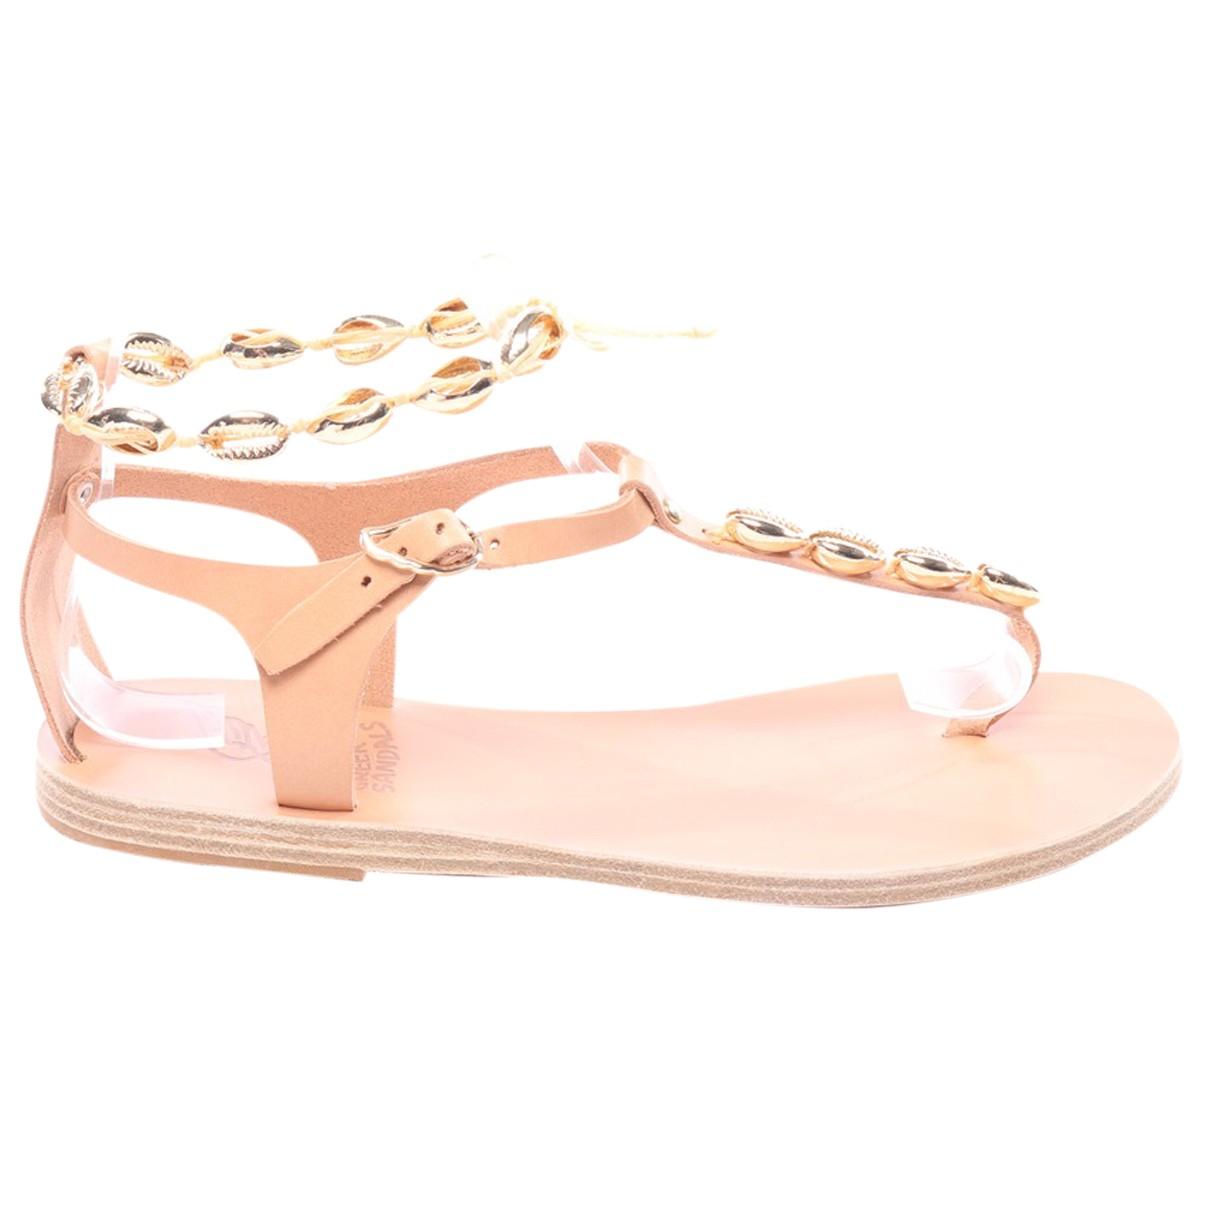 Sandalias romanas de Cuero Ancient Greek Sandals